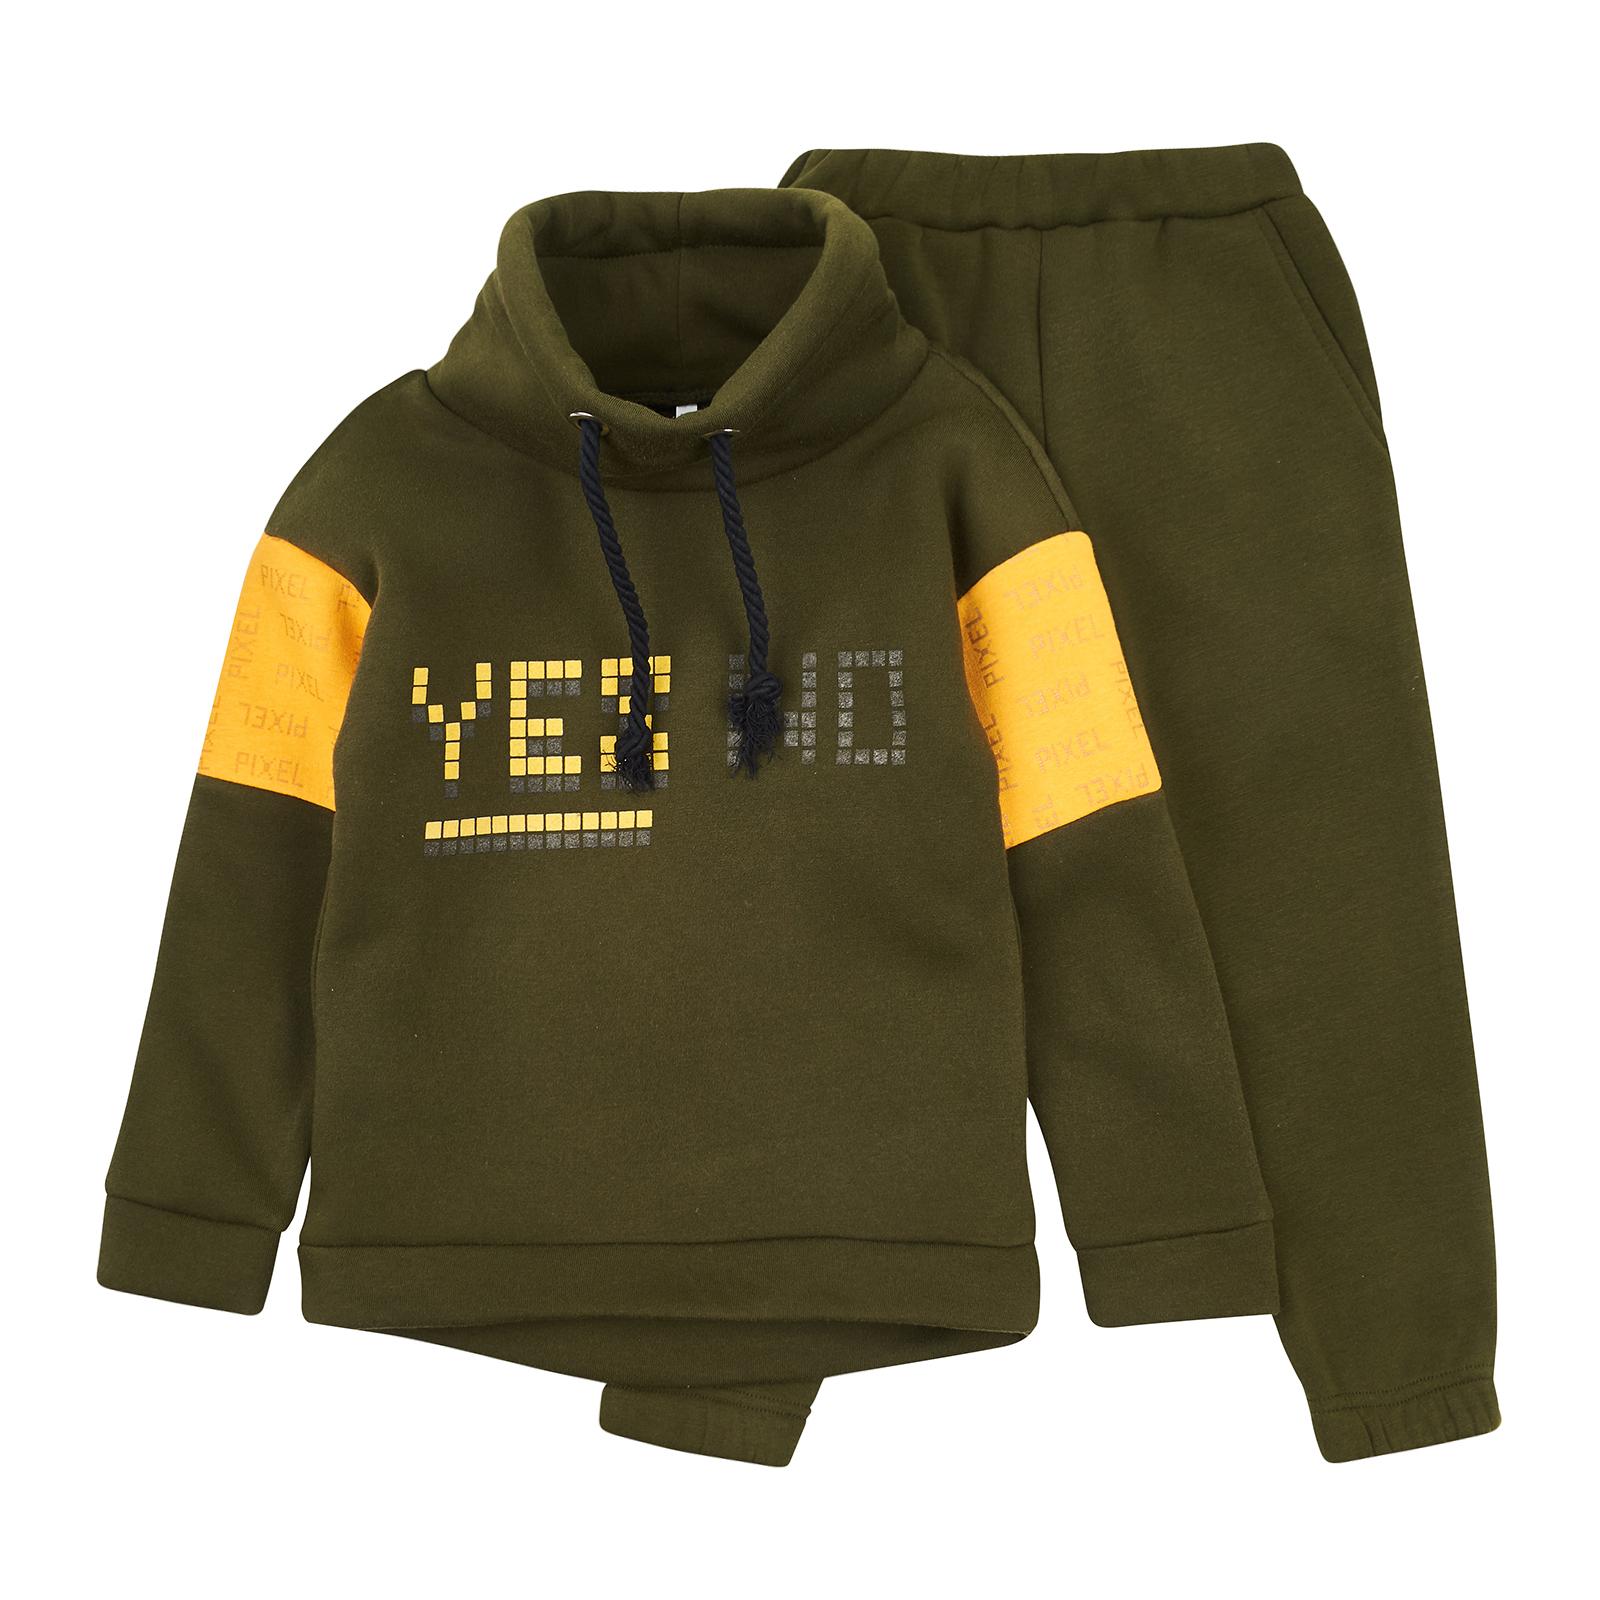 Костюм (спорт) детские O! Kids Clothing модель OKC~96591-1 цена, 2017